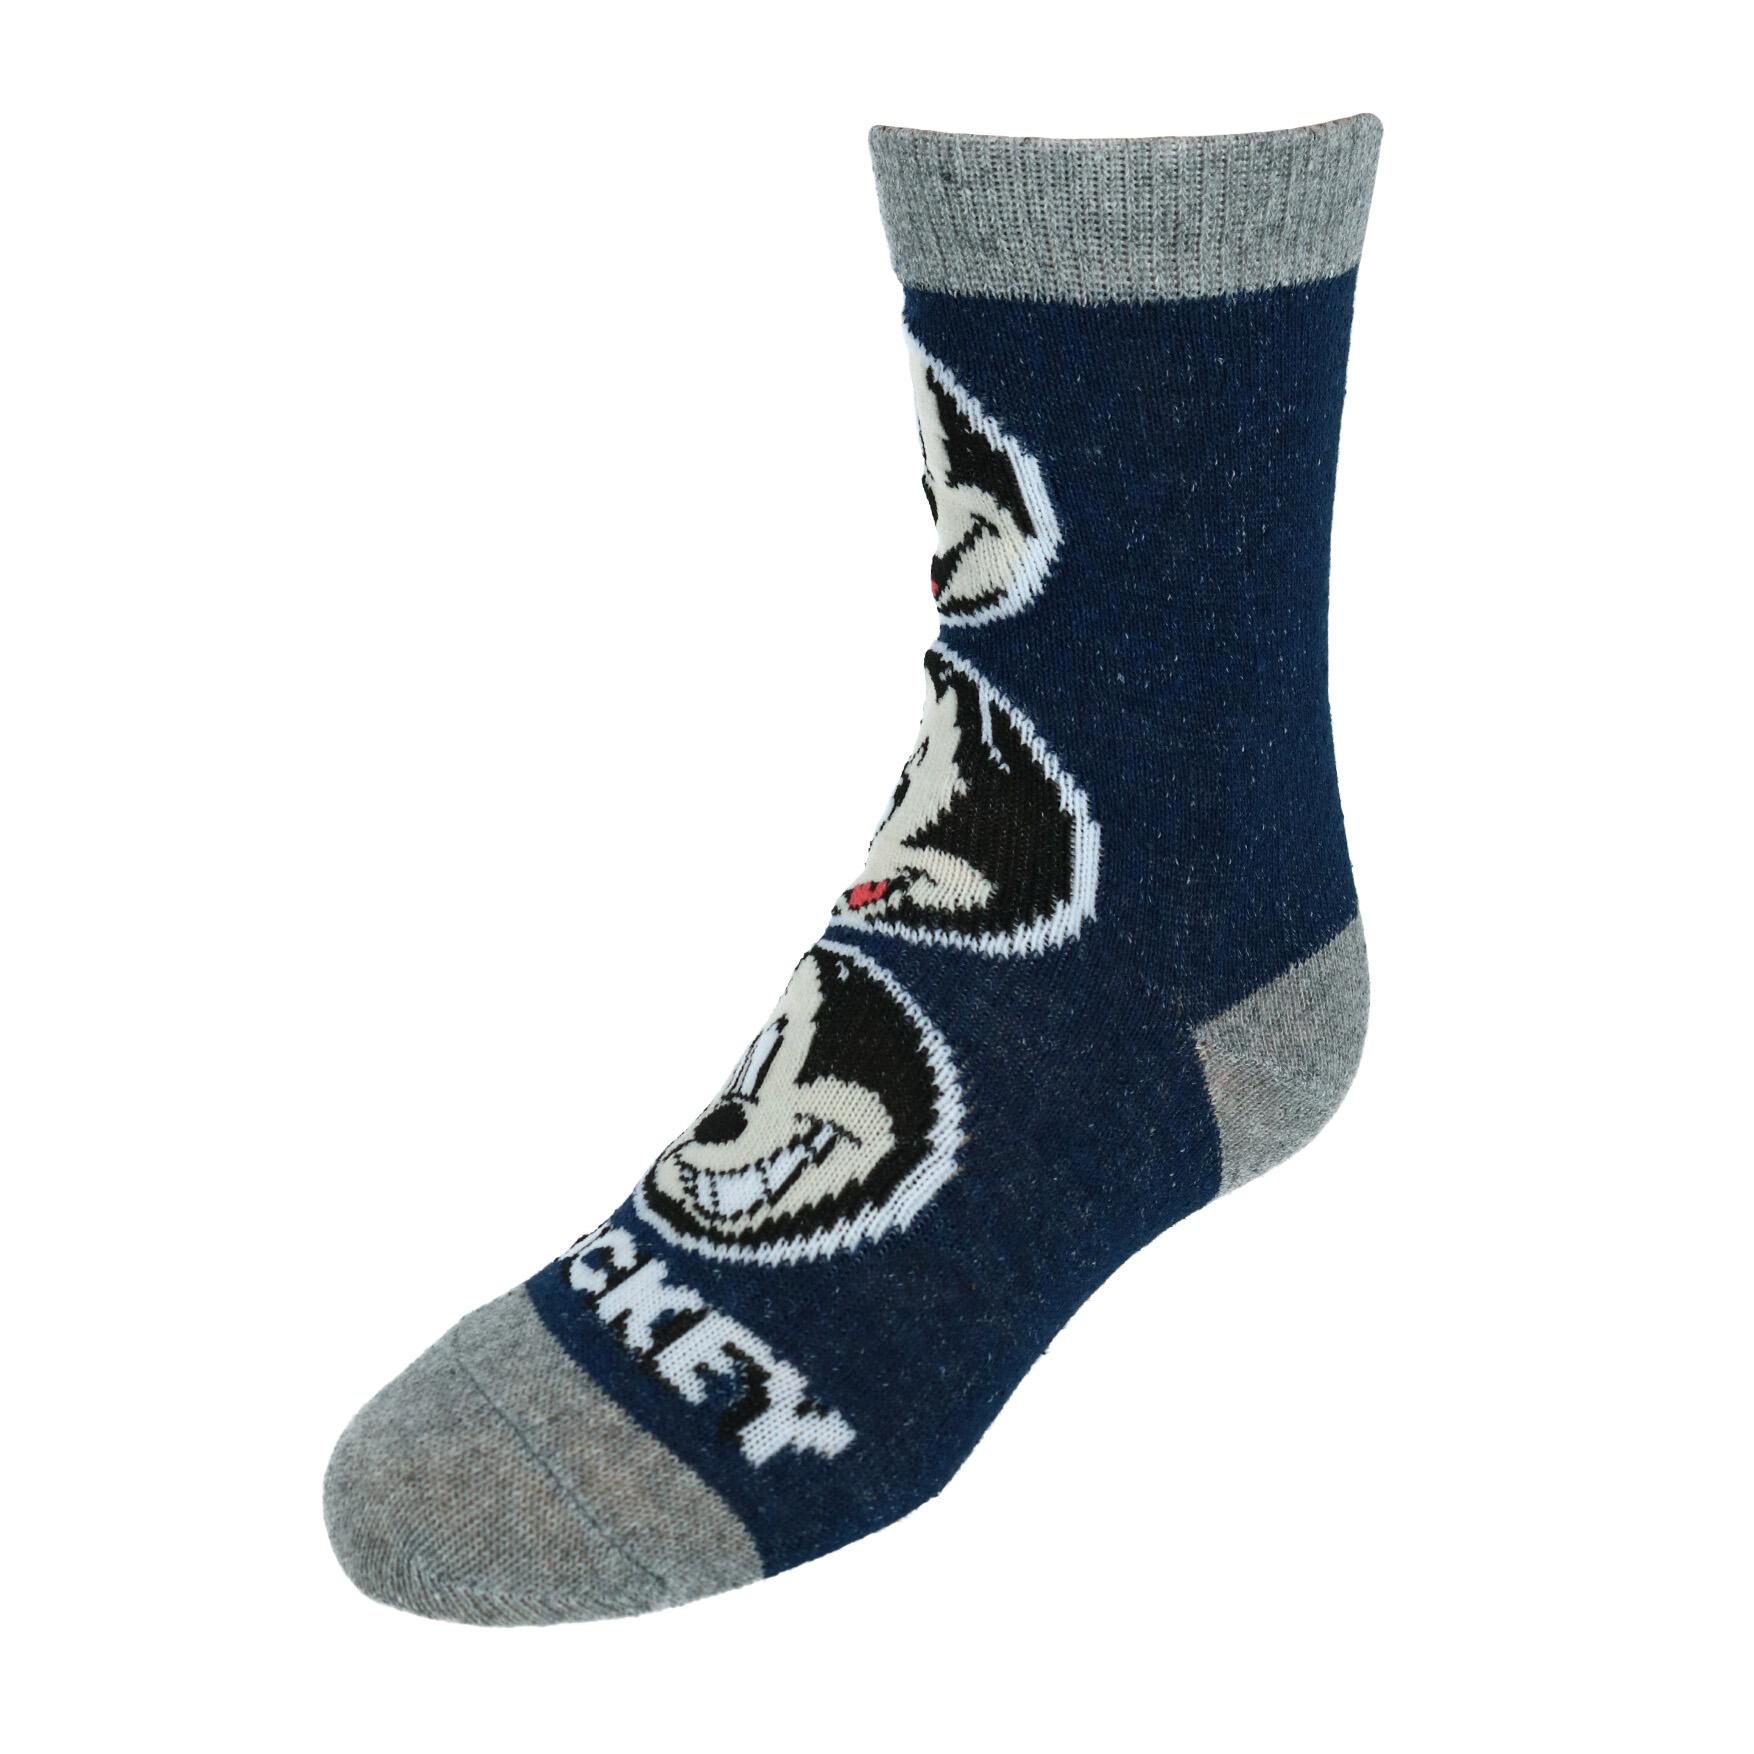 Disney Mickey Mouse Boys Crew Socks Striped Multi Color 3 Pair Shoe Size 4-8.5